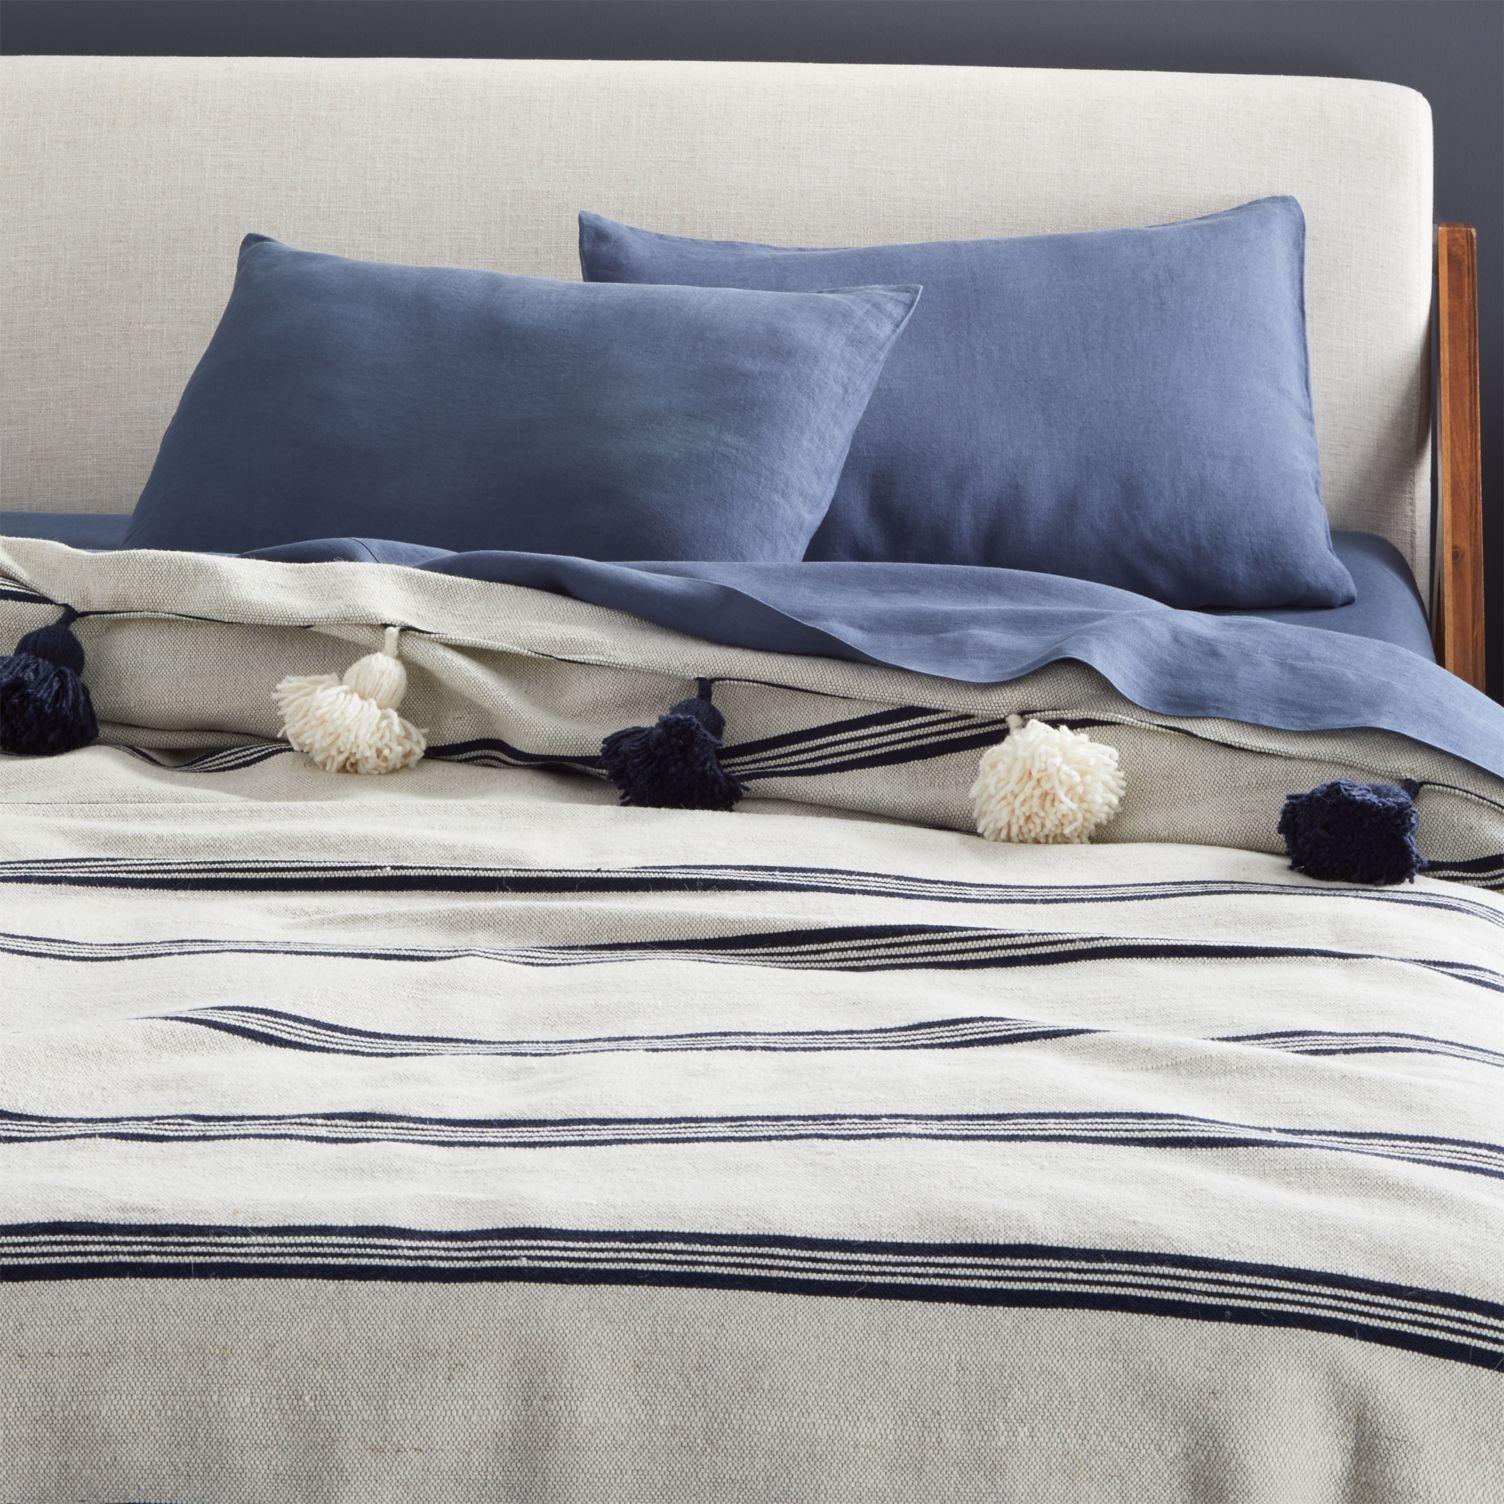 Tasseled blanket with stripes